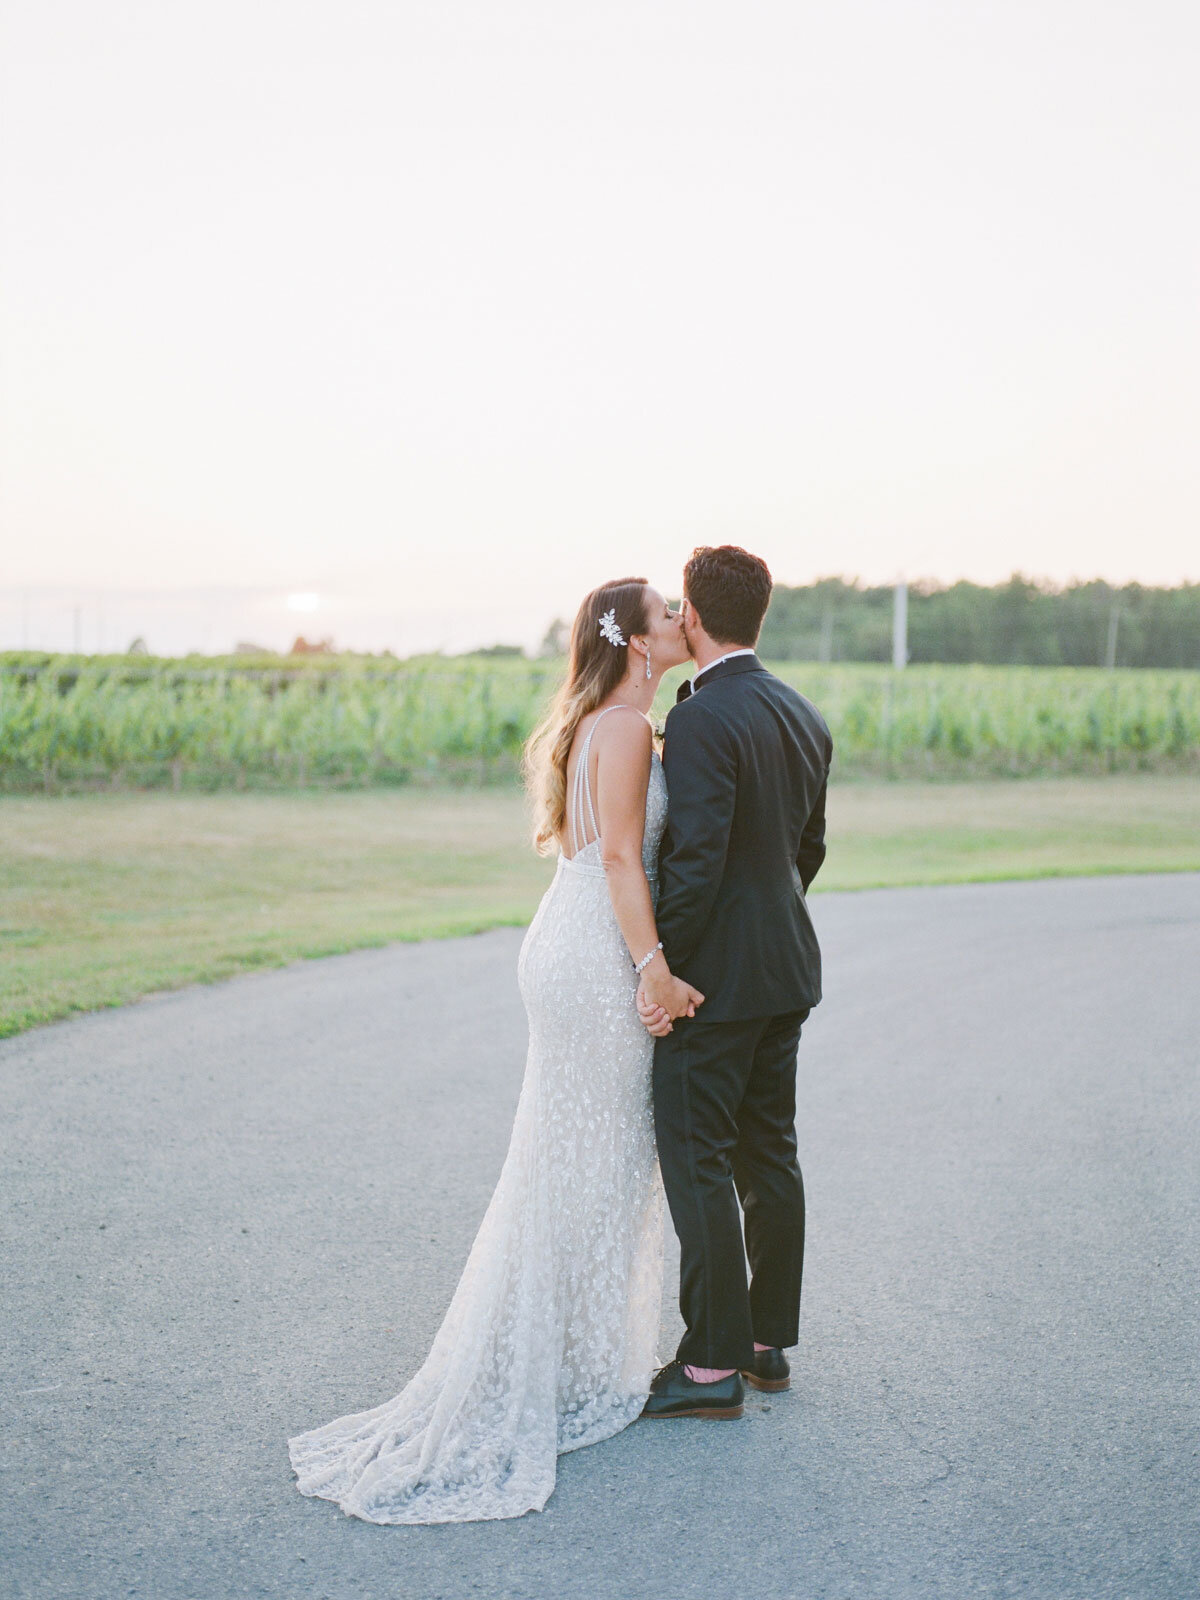 Chateau-des-Charmes-Wedding-Summer-Vineyard-Bride-Niagara-on-the-Lake-photos-by-Gemini-Photography-Ontario-0082.jpg